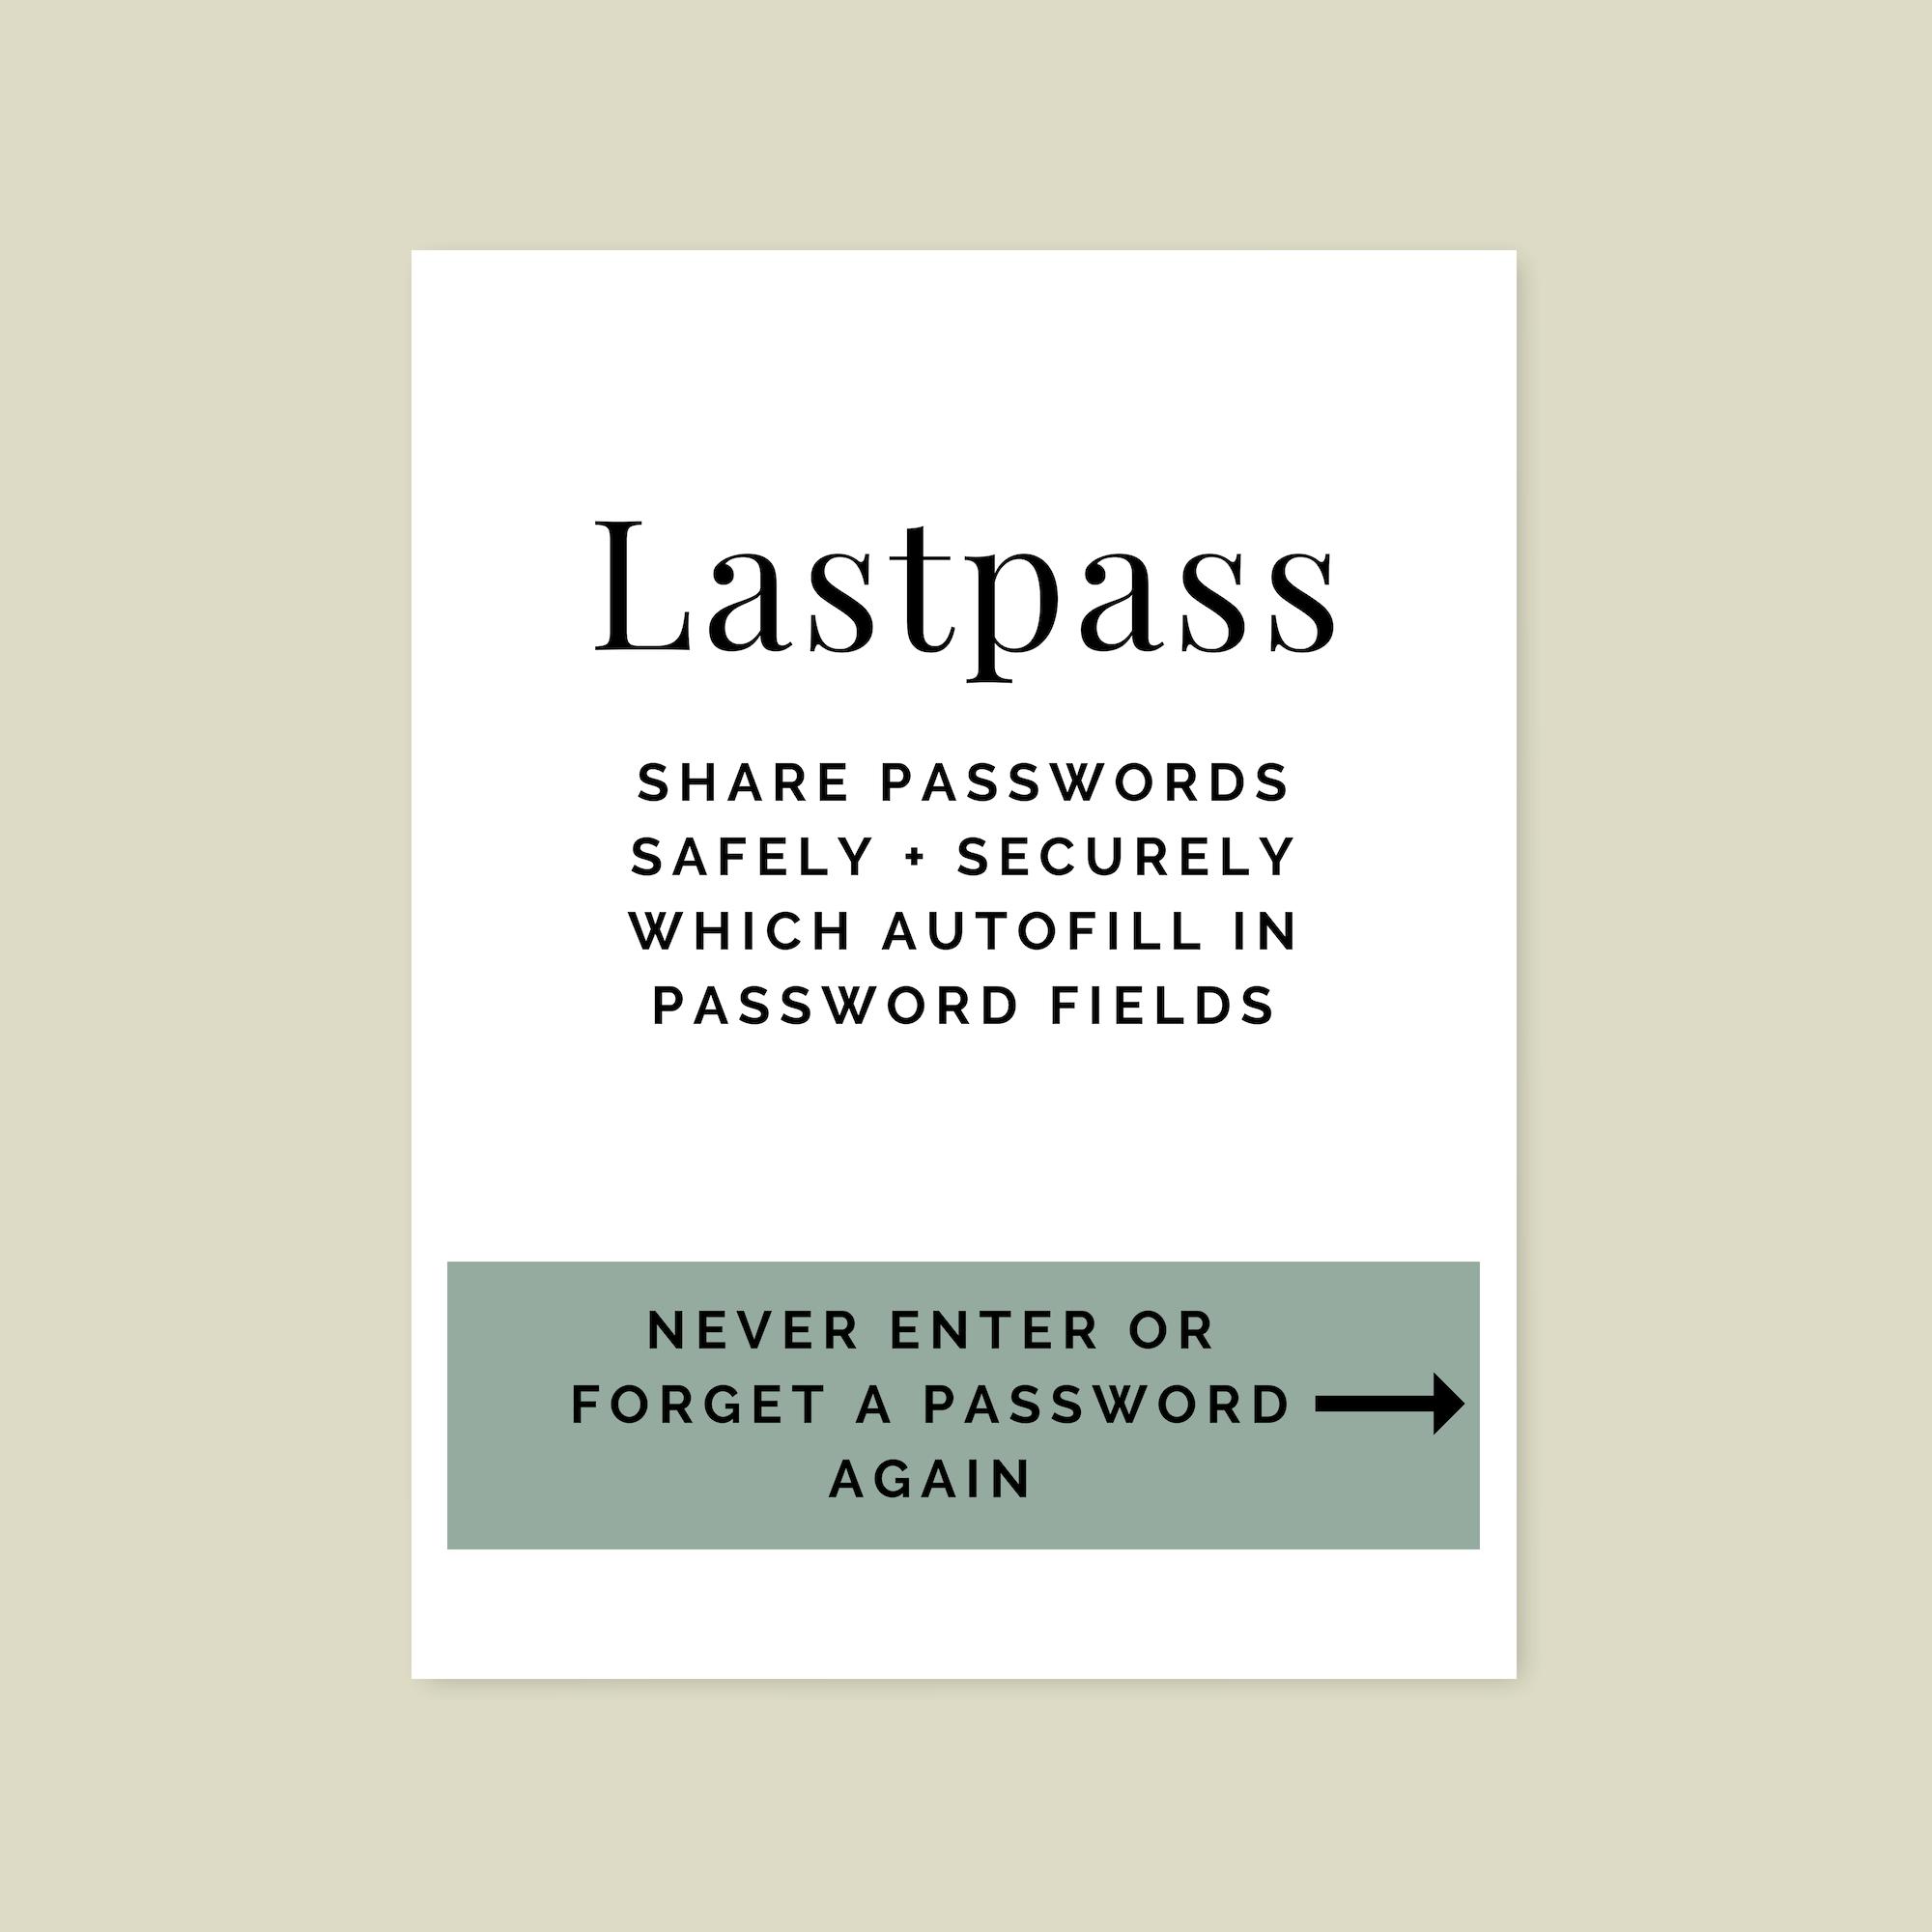 https://www.lastpass.com/